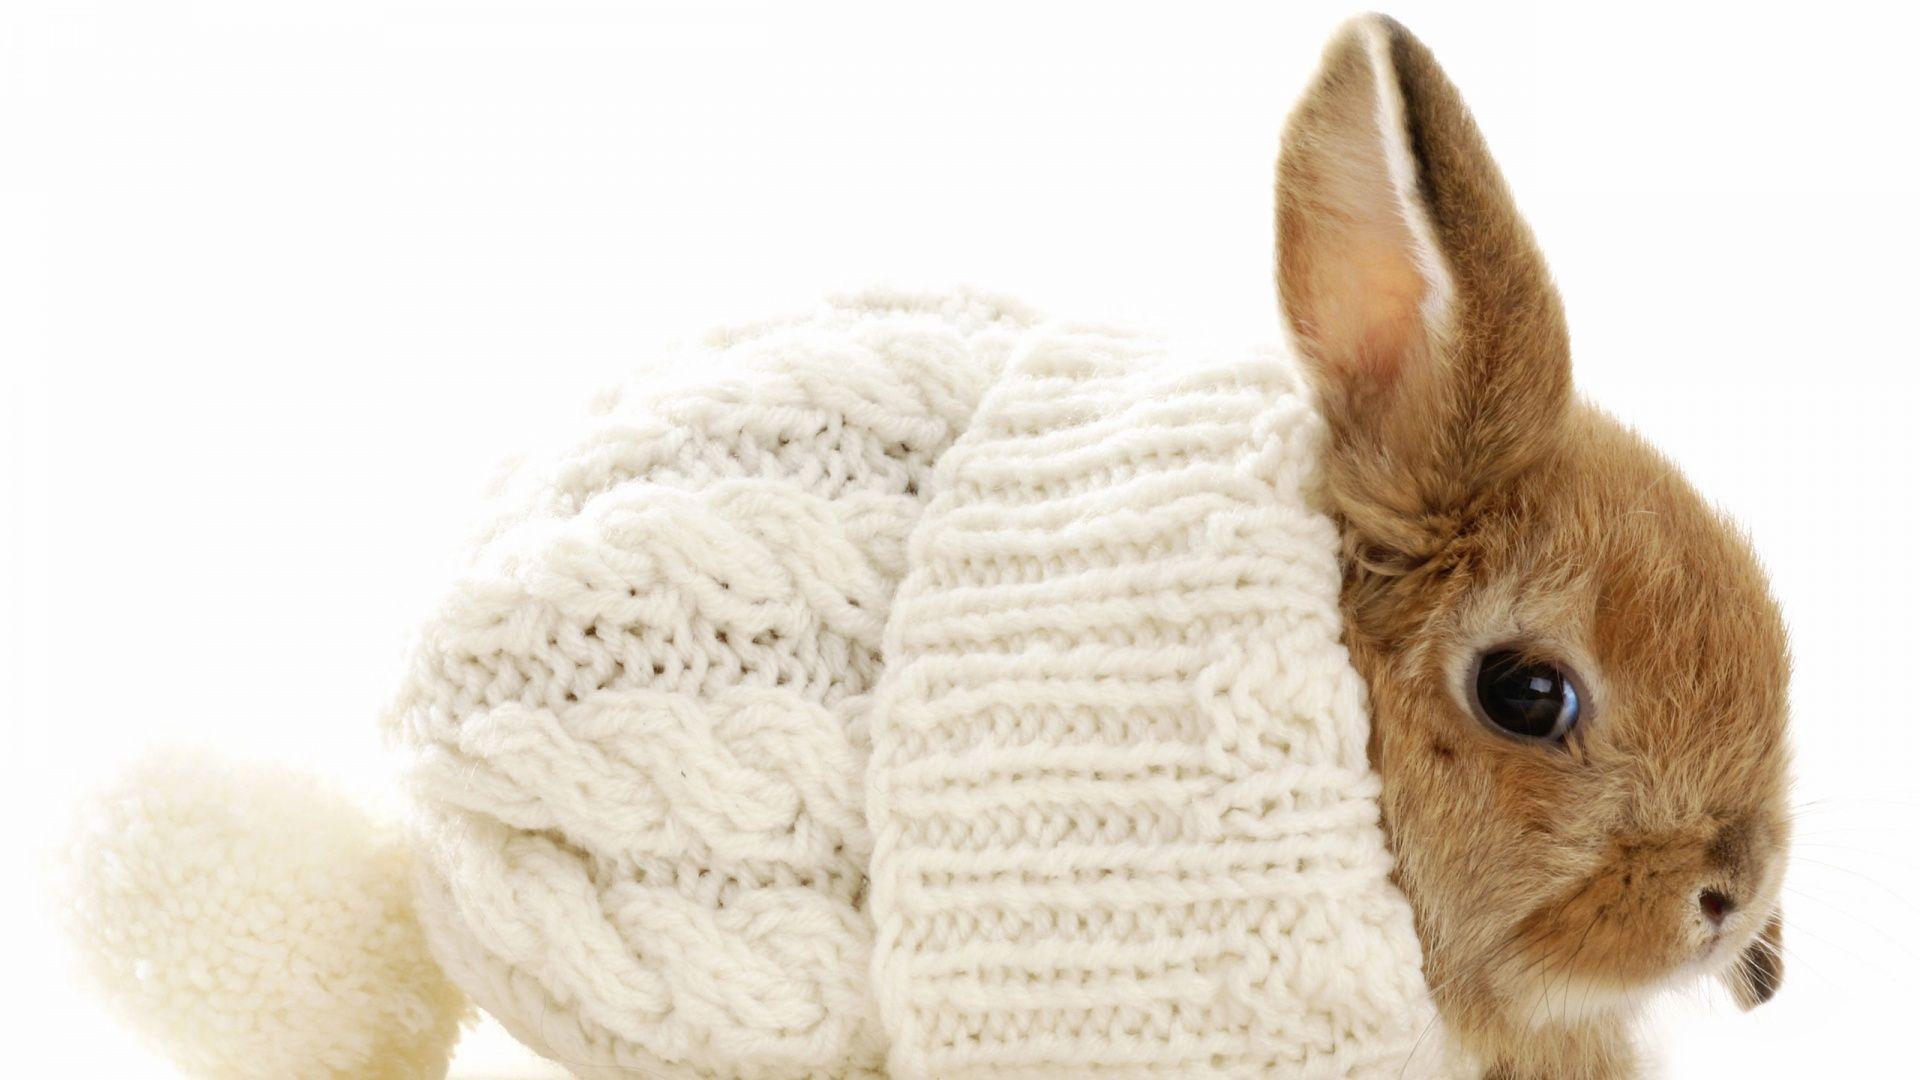 Xmas Stuff For Christmas Rabbit Wallpaper